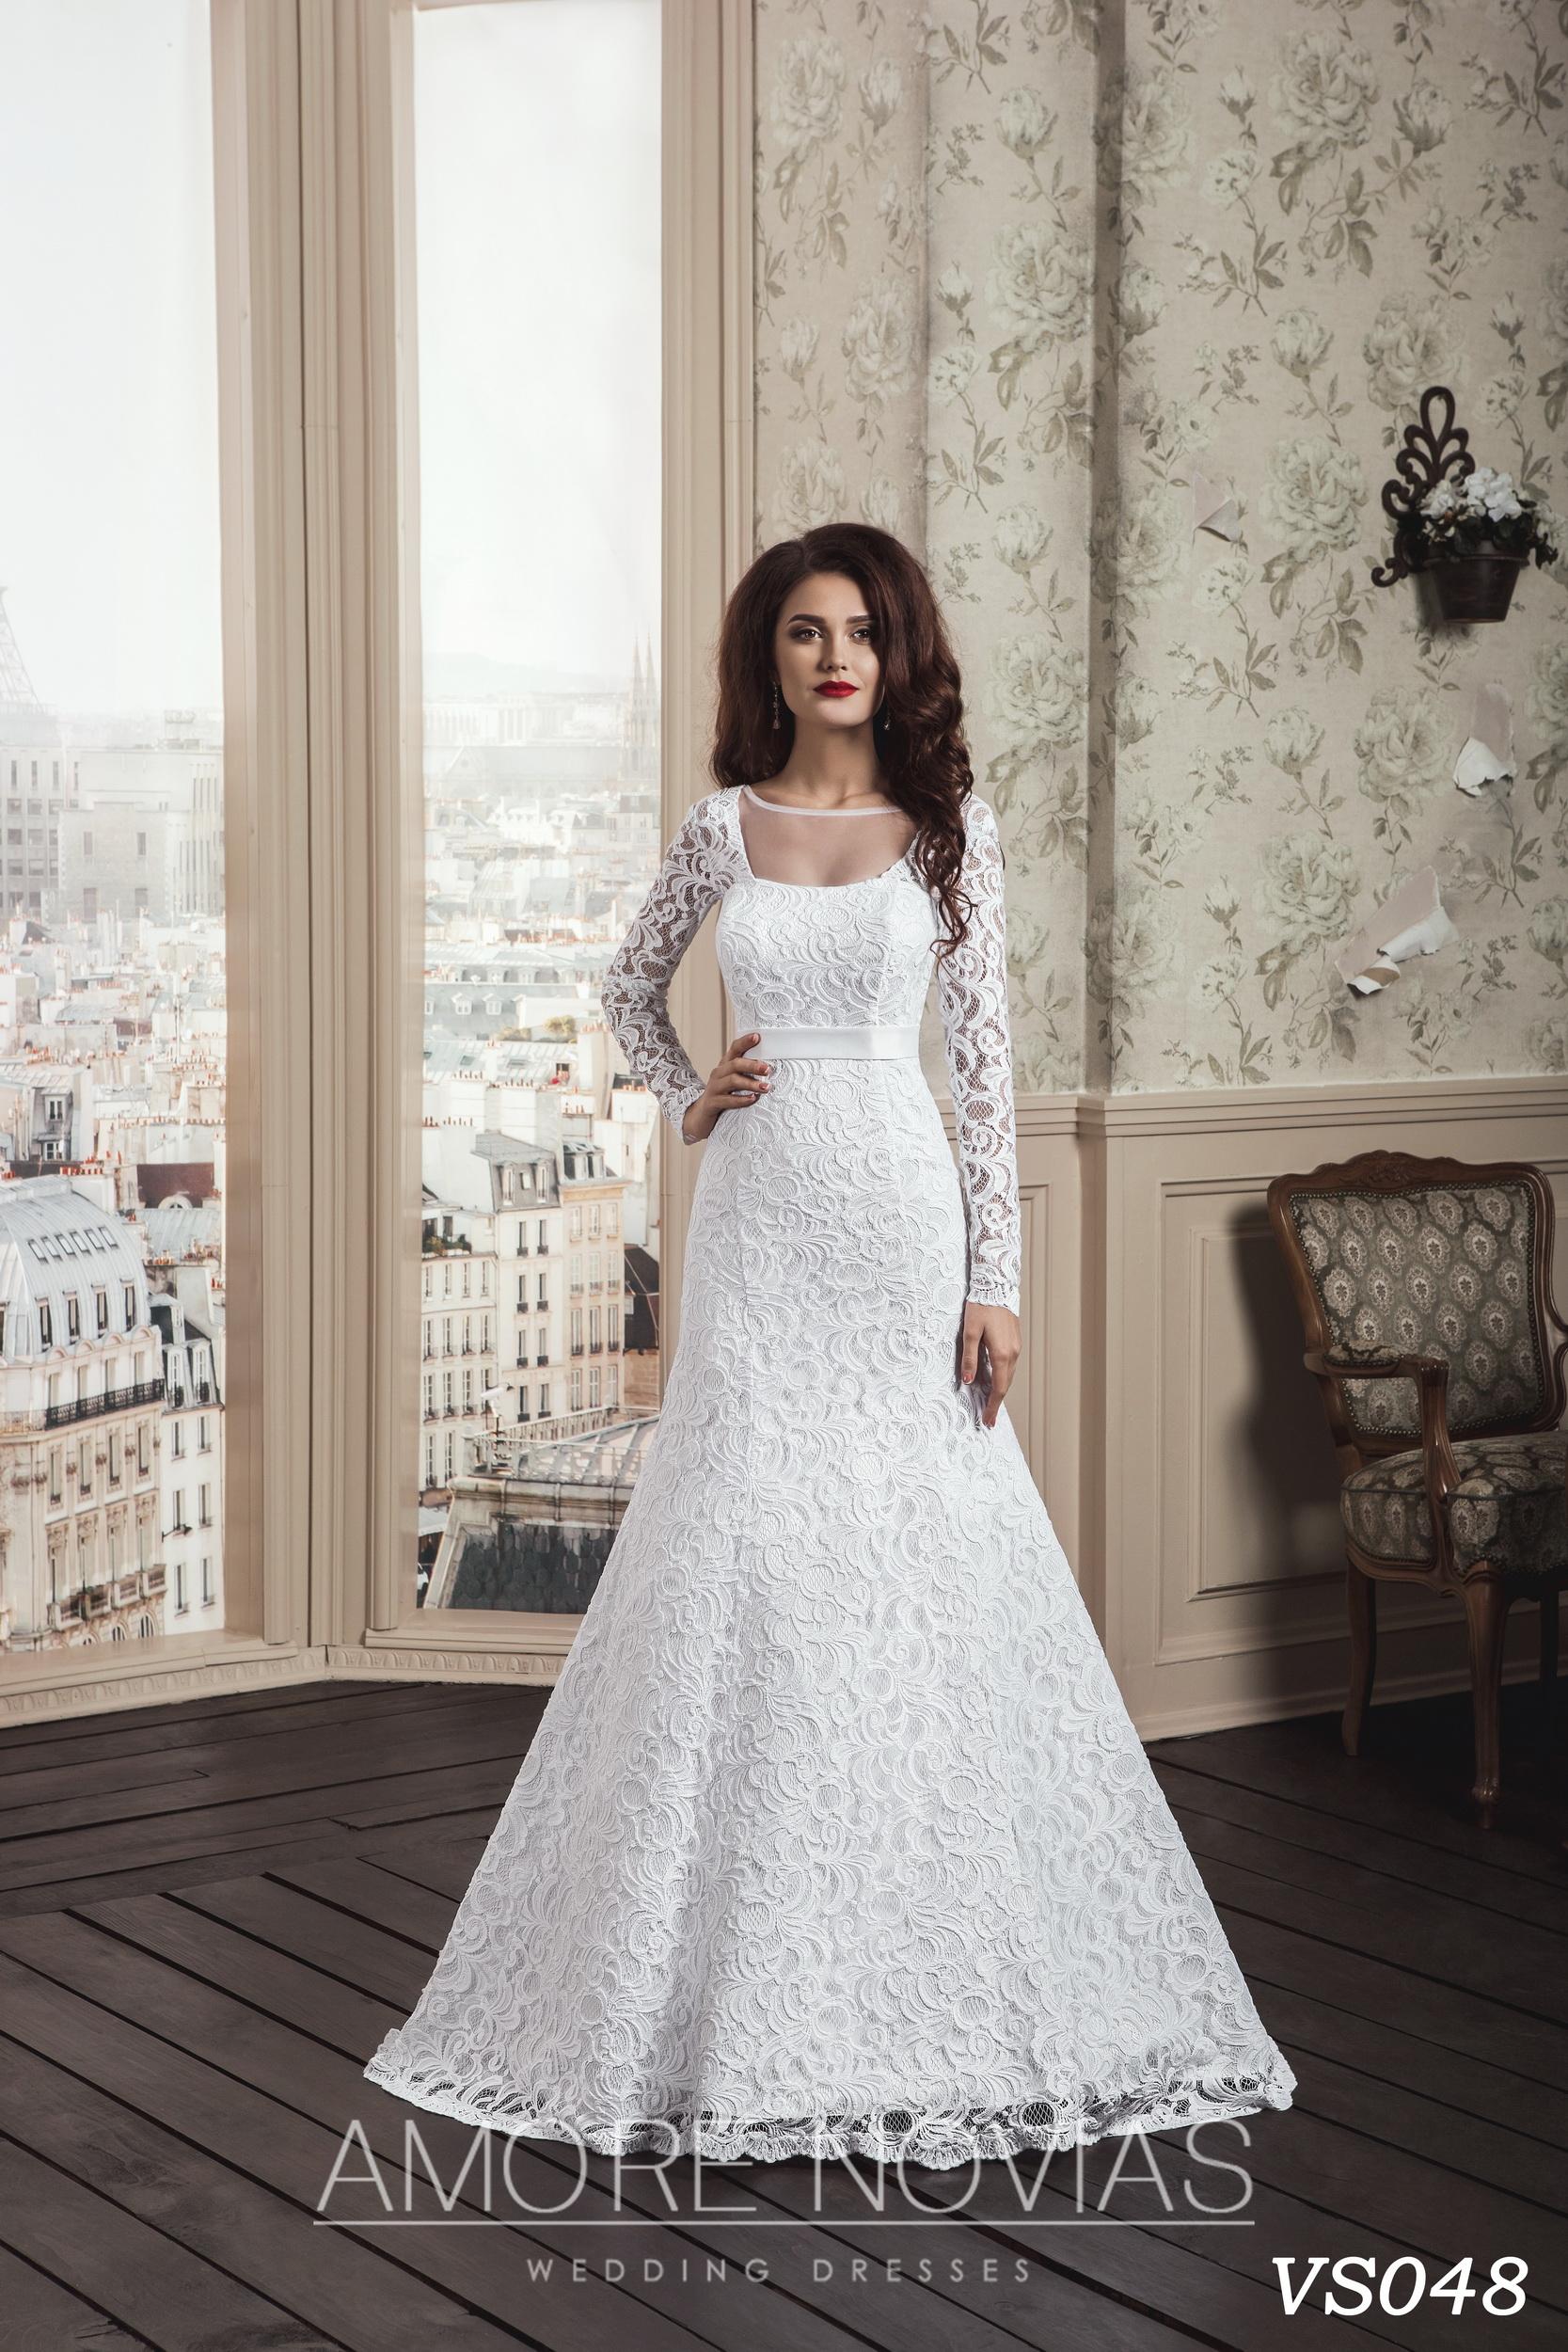 http://amore-novias.com/images/stories/virtuemart/product/vs048.jpg